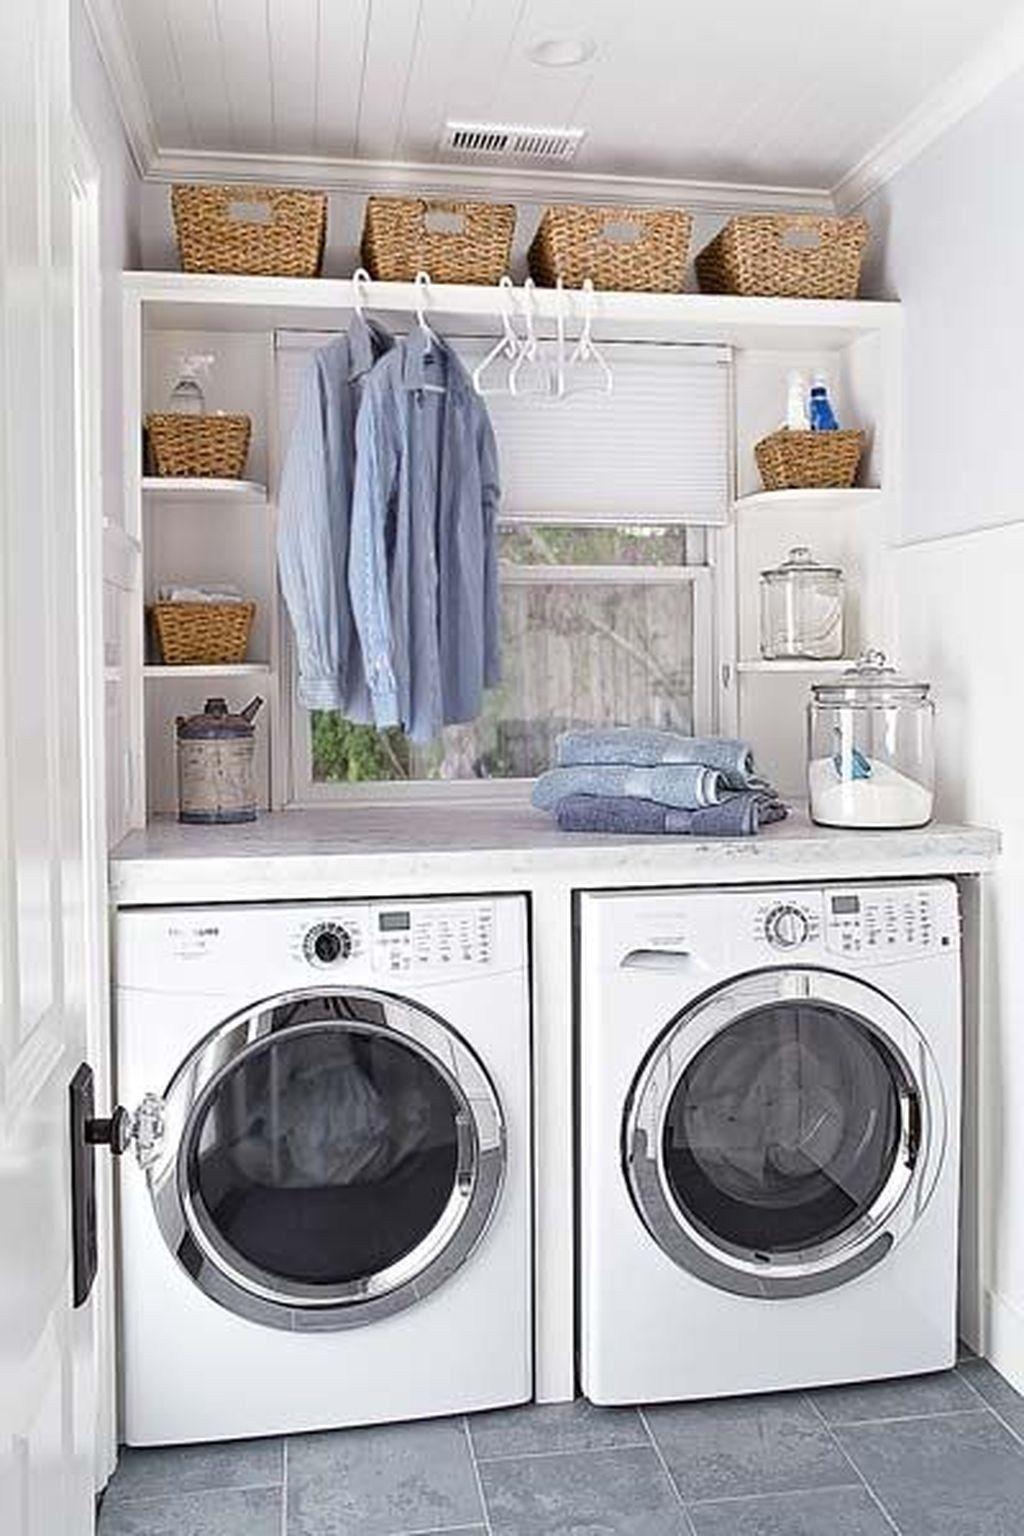 30 brilliant small laundry room decorating ideas to on extraordinary small laundry room design and decorating ideas modest laundry space id=80856